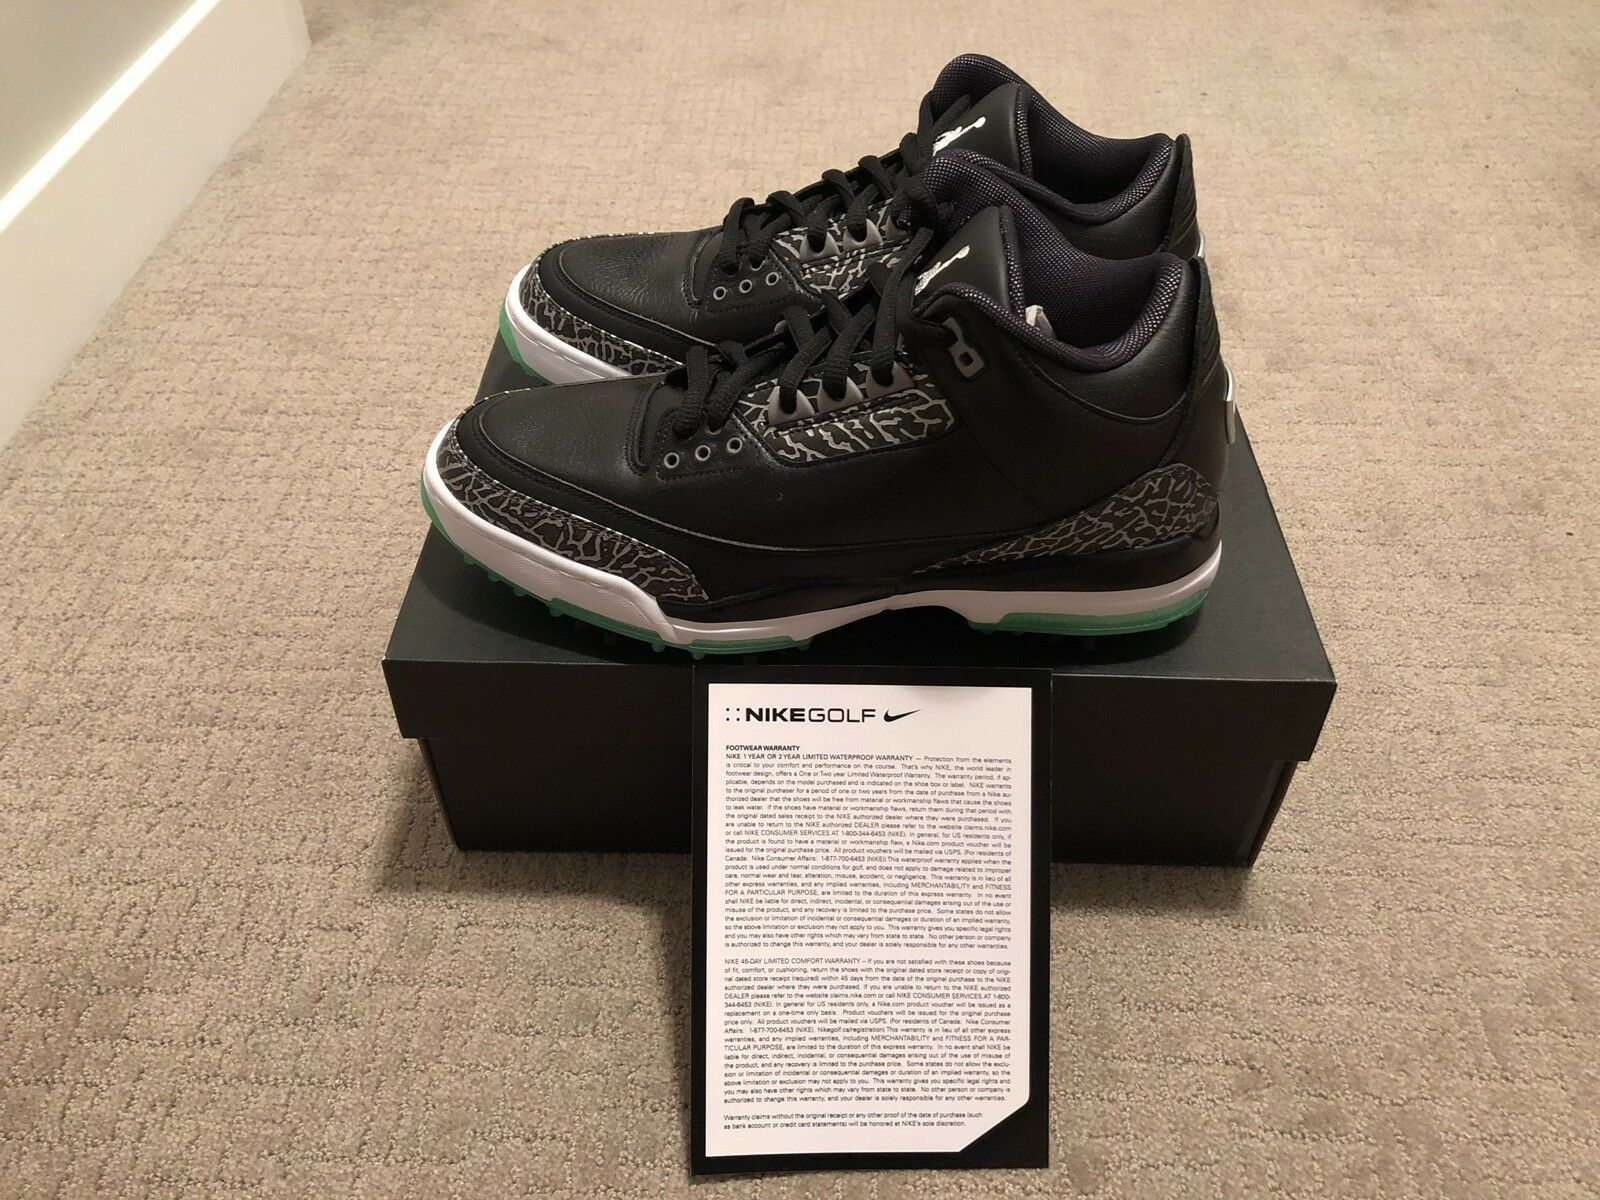 Nike Jordan Retro 3 Golf Shoe Black Green Glow Size 9.5   IN HAND